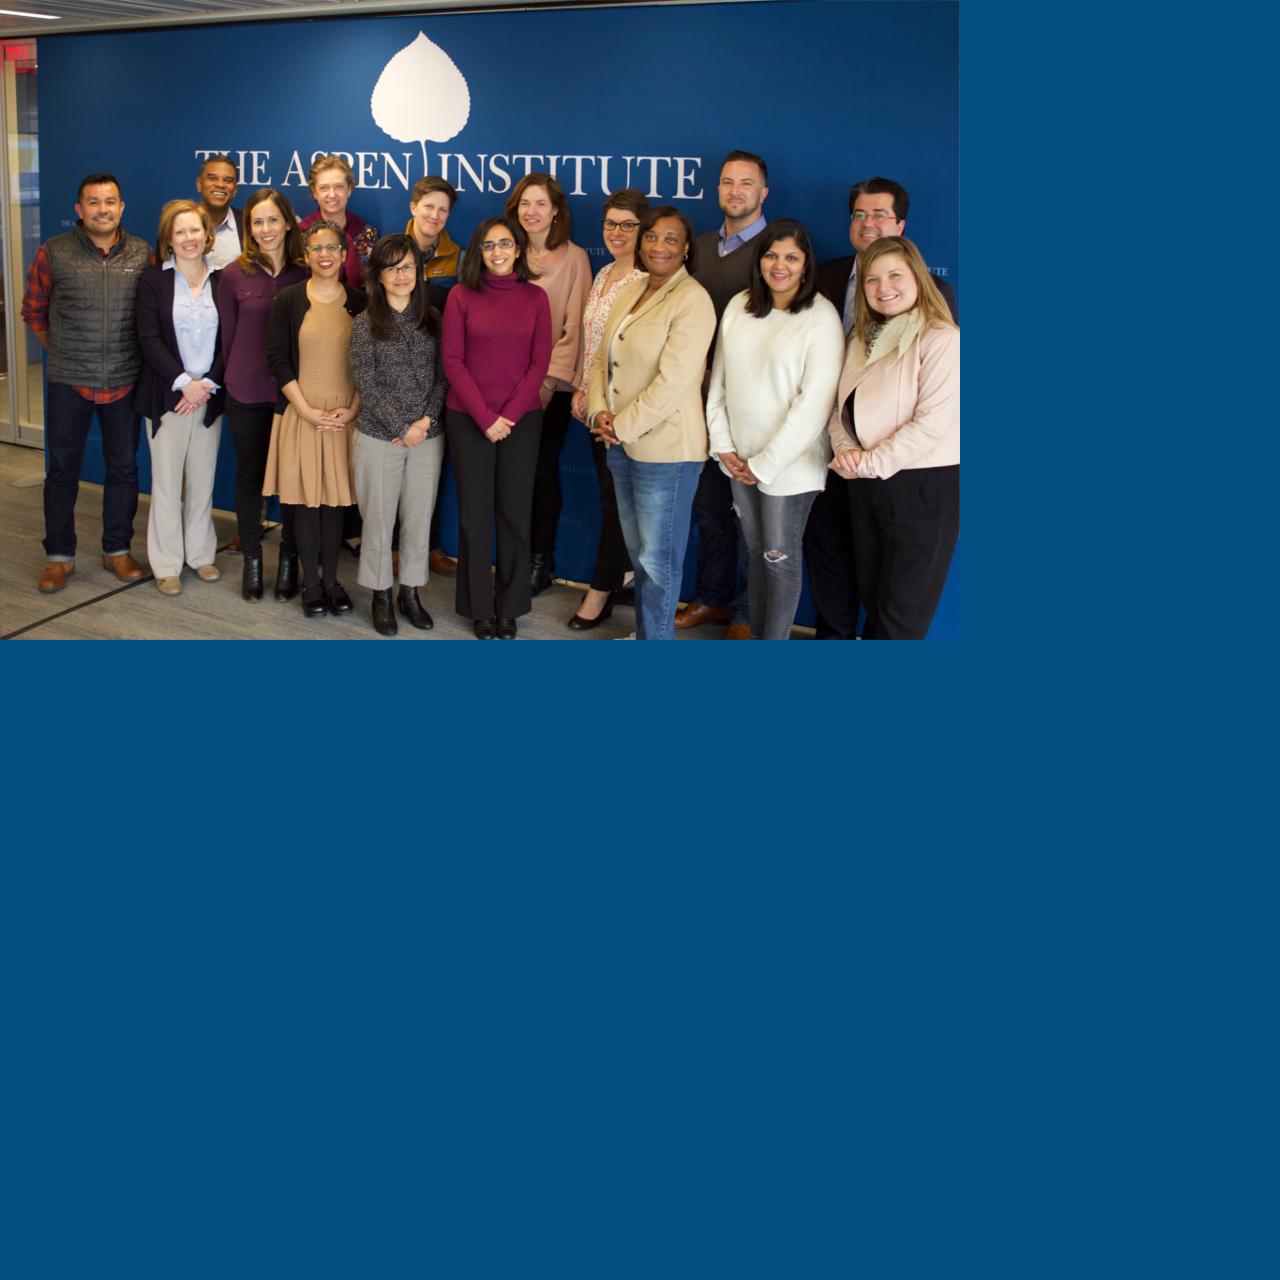 Job Quality Fellows Class of 2017-18